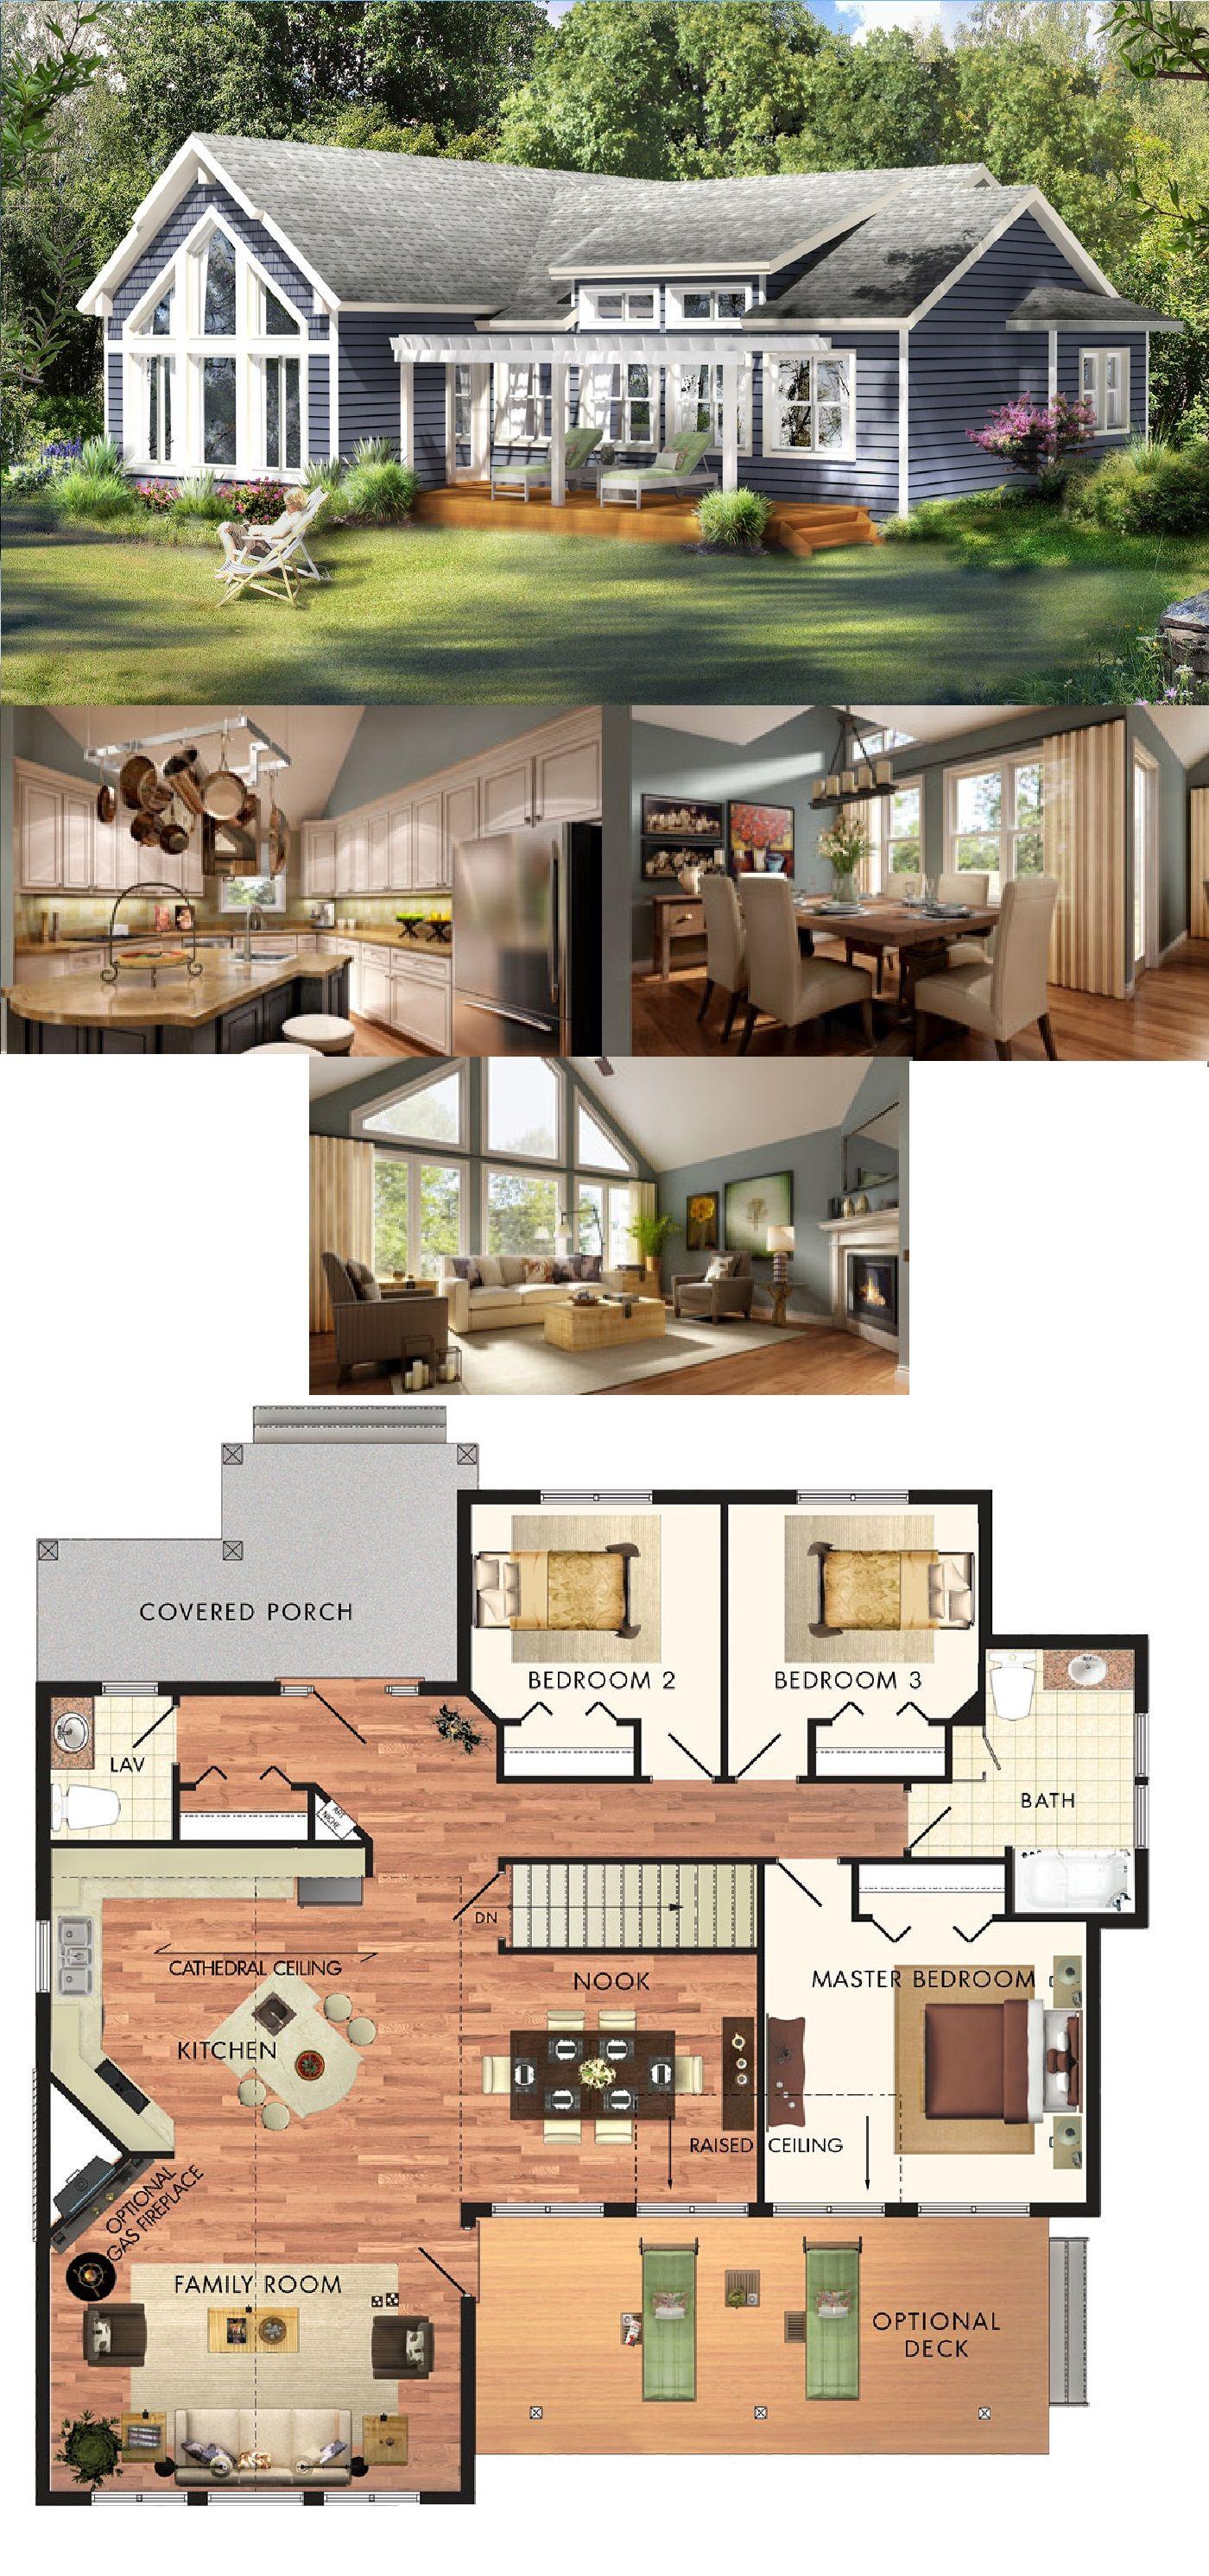 Beaver homes cottages aspen ii 1393 sq ft home for Beaver home designs